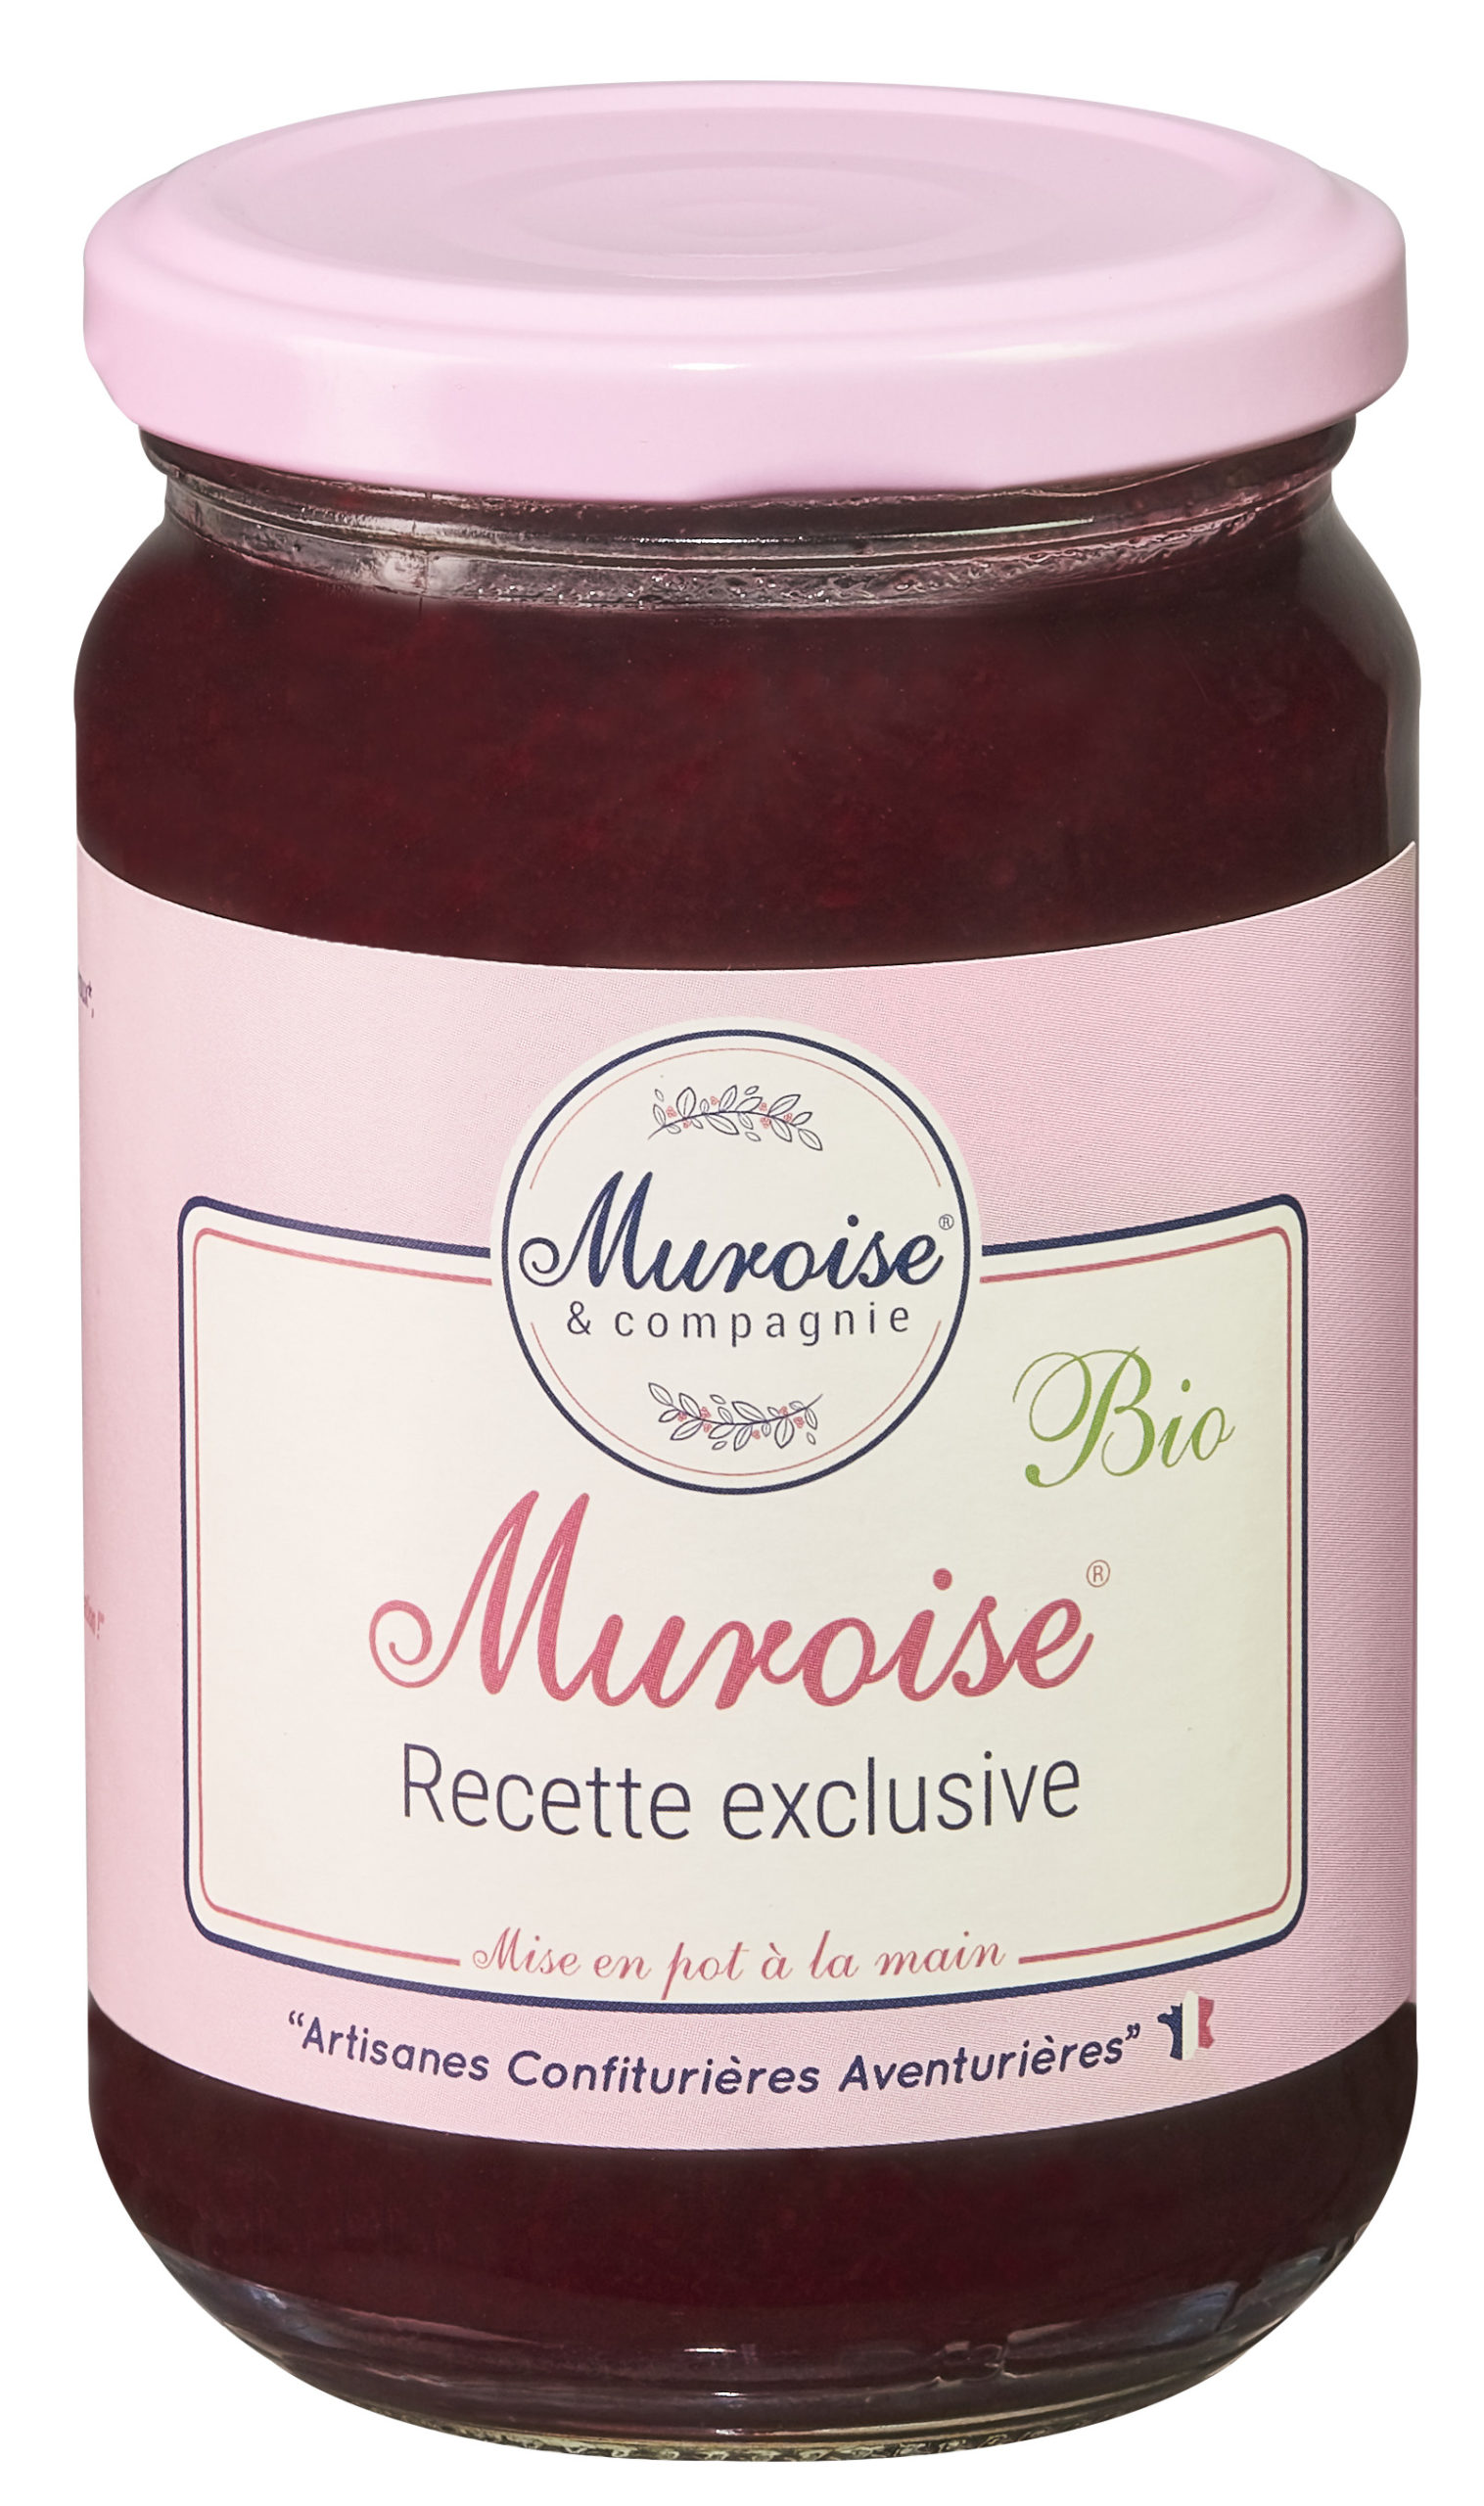 Muroise & Compagnie